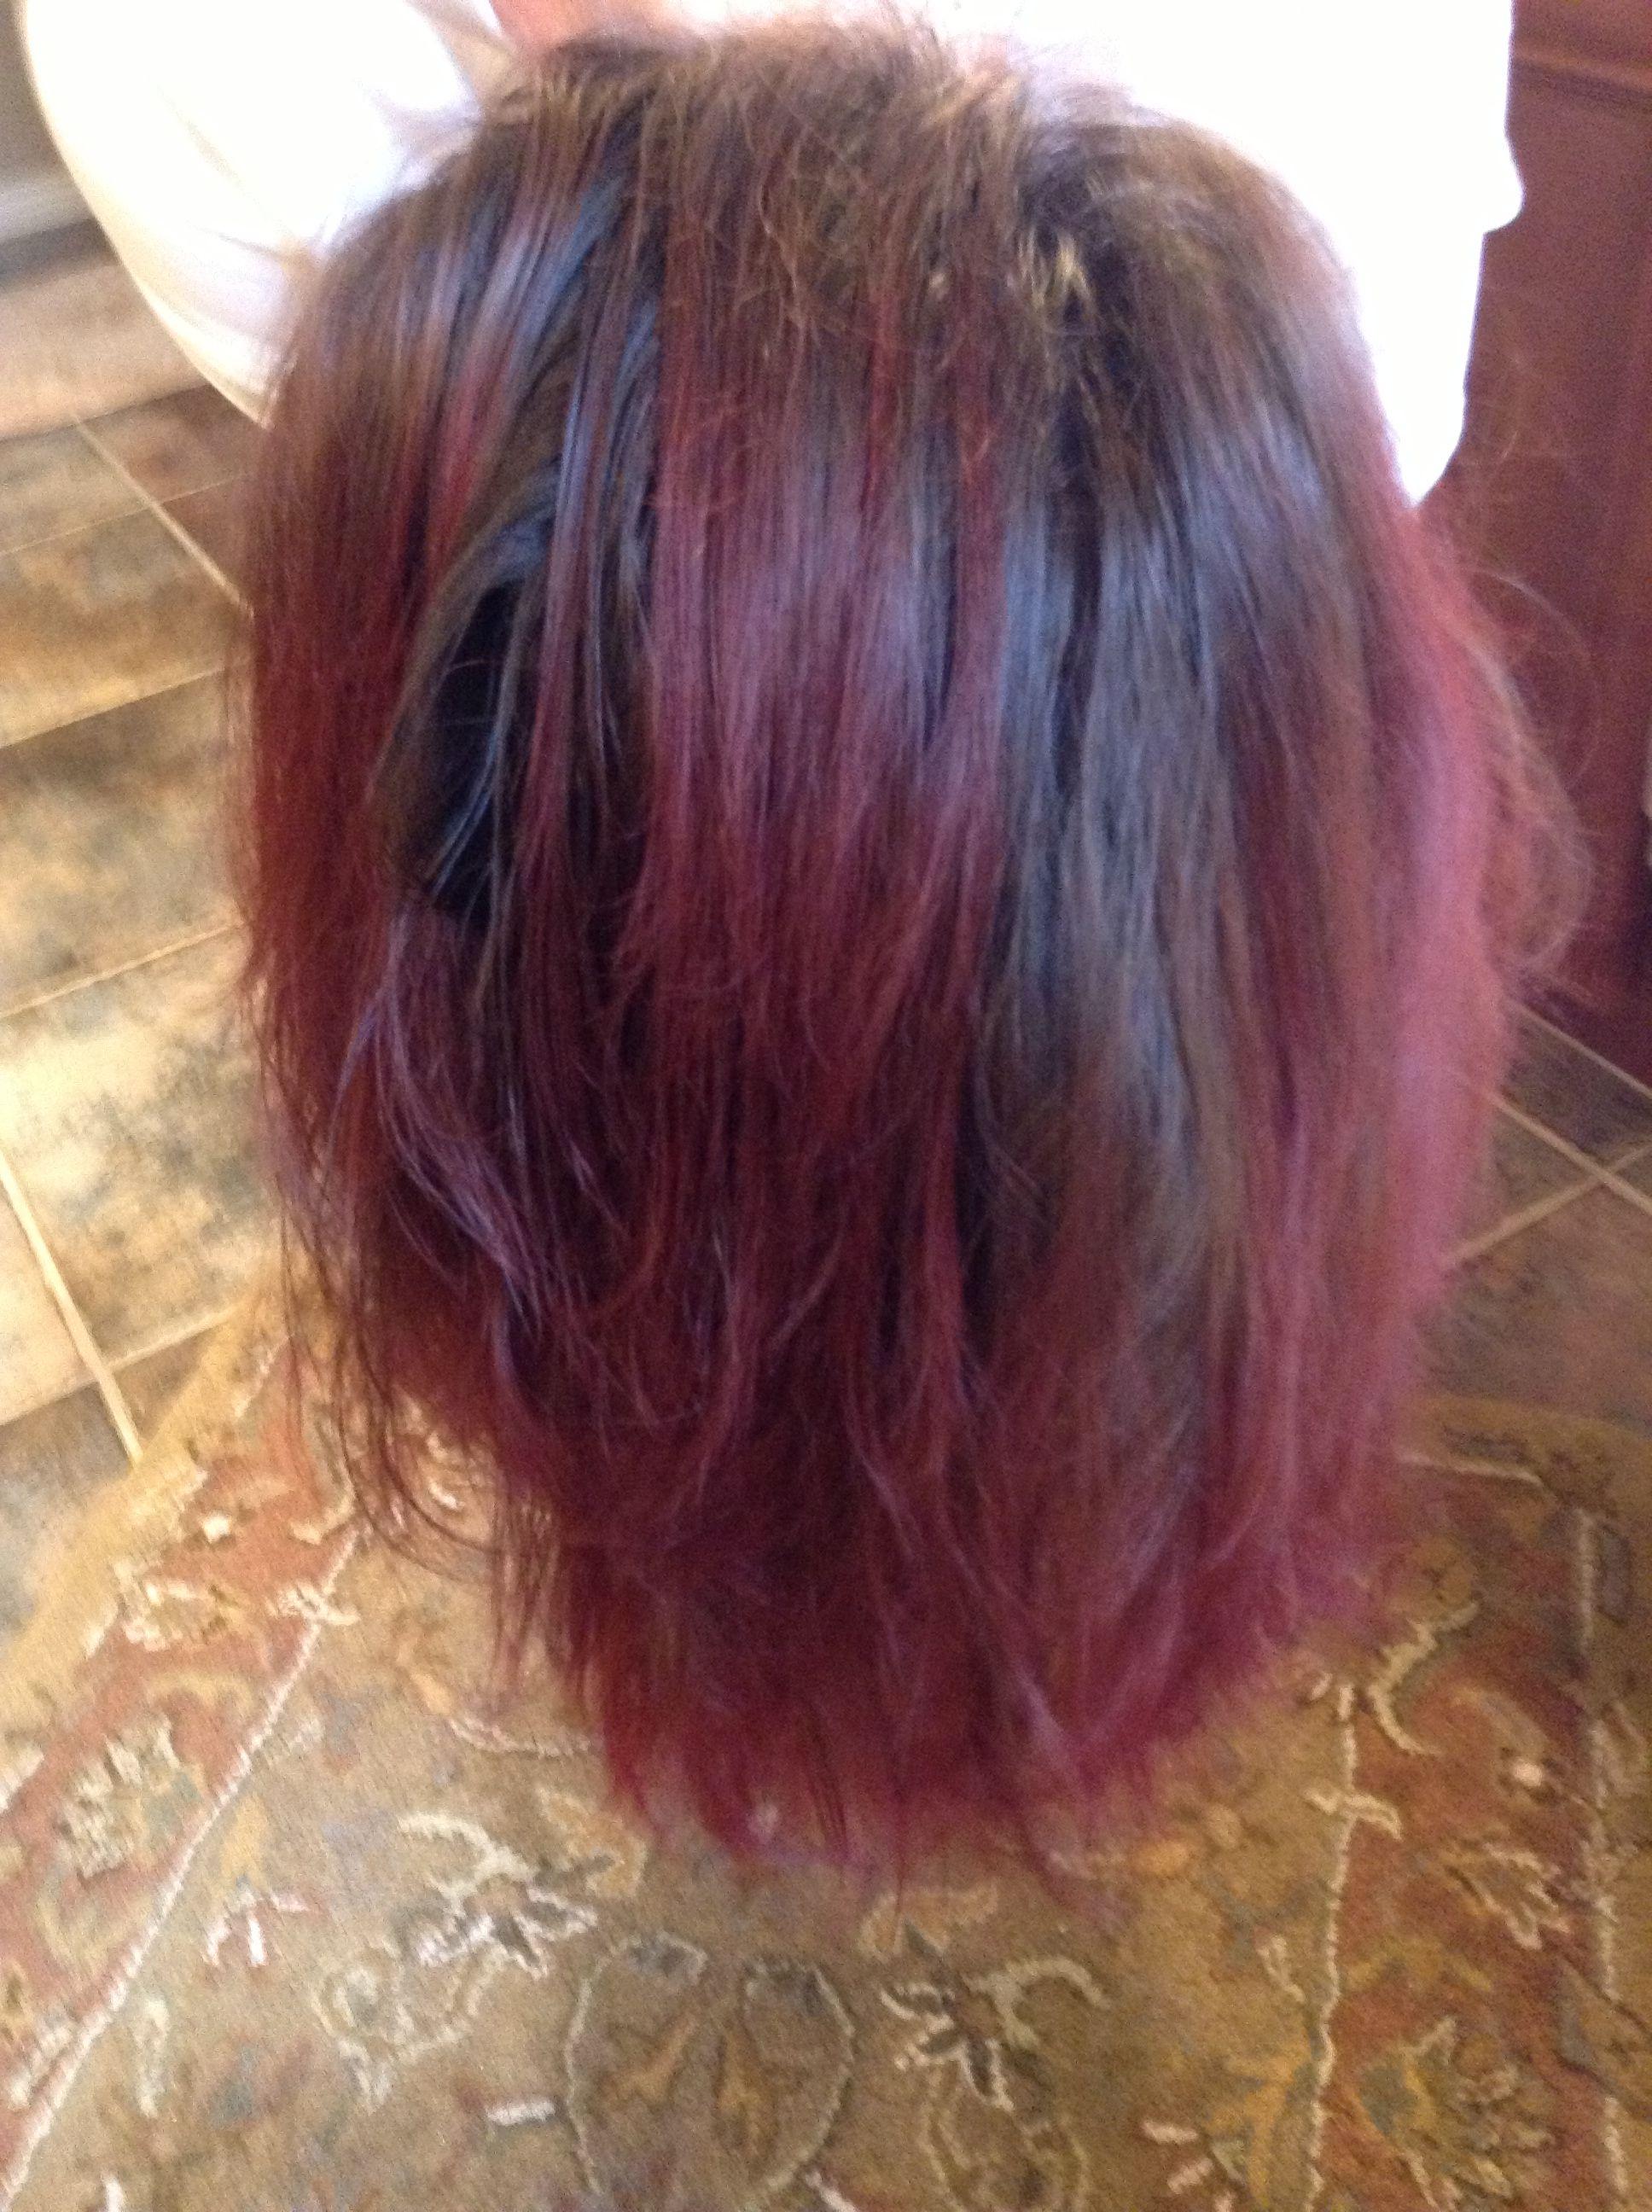 Cat B S Kool Aid Dip Dye I Have Super Dark Hair And Guess What I Didn T Even Bleach It But Make Yourself Comf Kool Aid Hair Dye Hair Dye Colors Kool